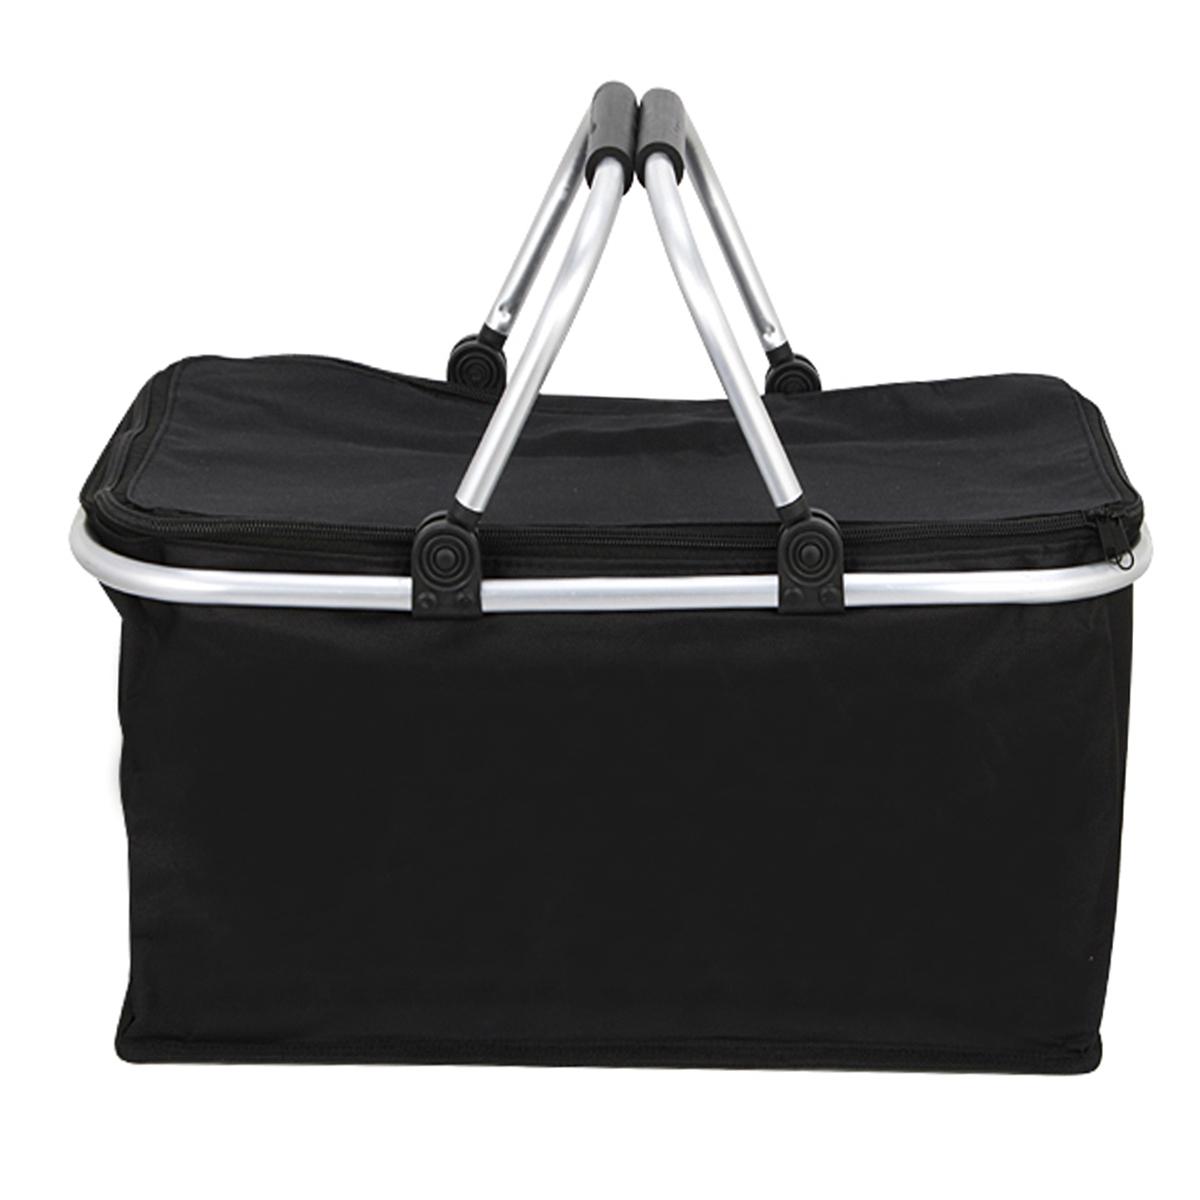 IPRee™ 30L Folding Camp Picnic Insulated Bag Ice Cooler Hamper Lunch Food Storage Basket